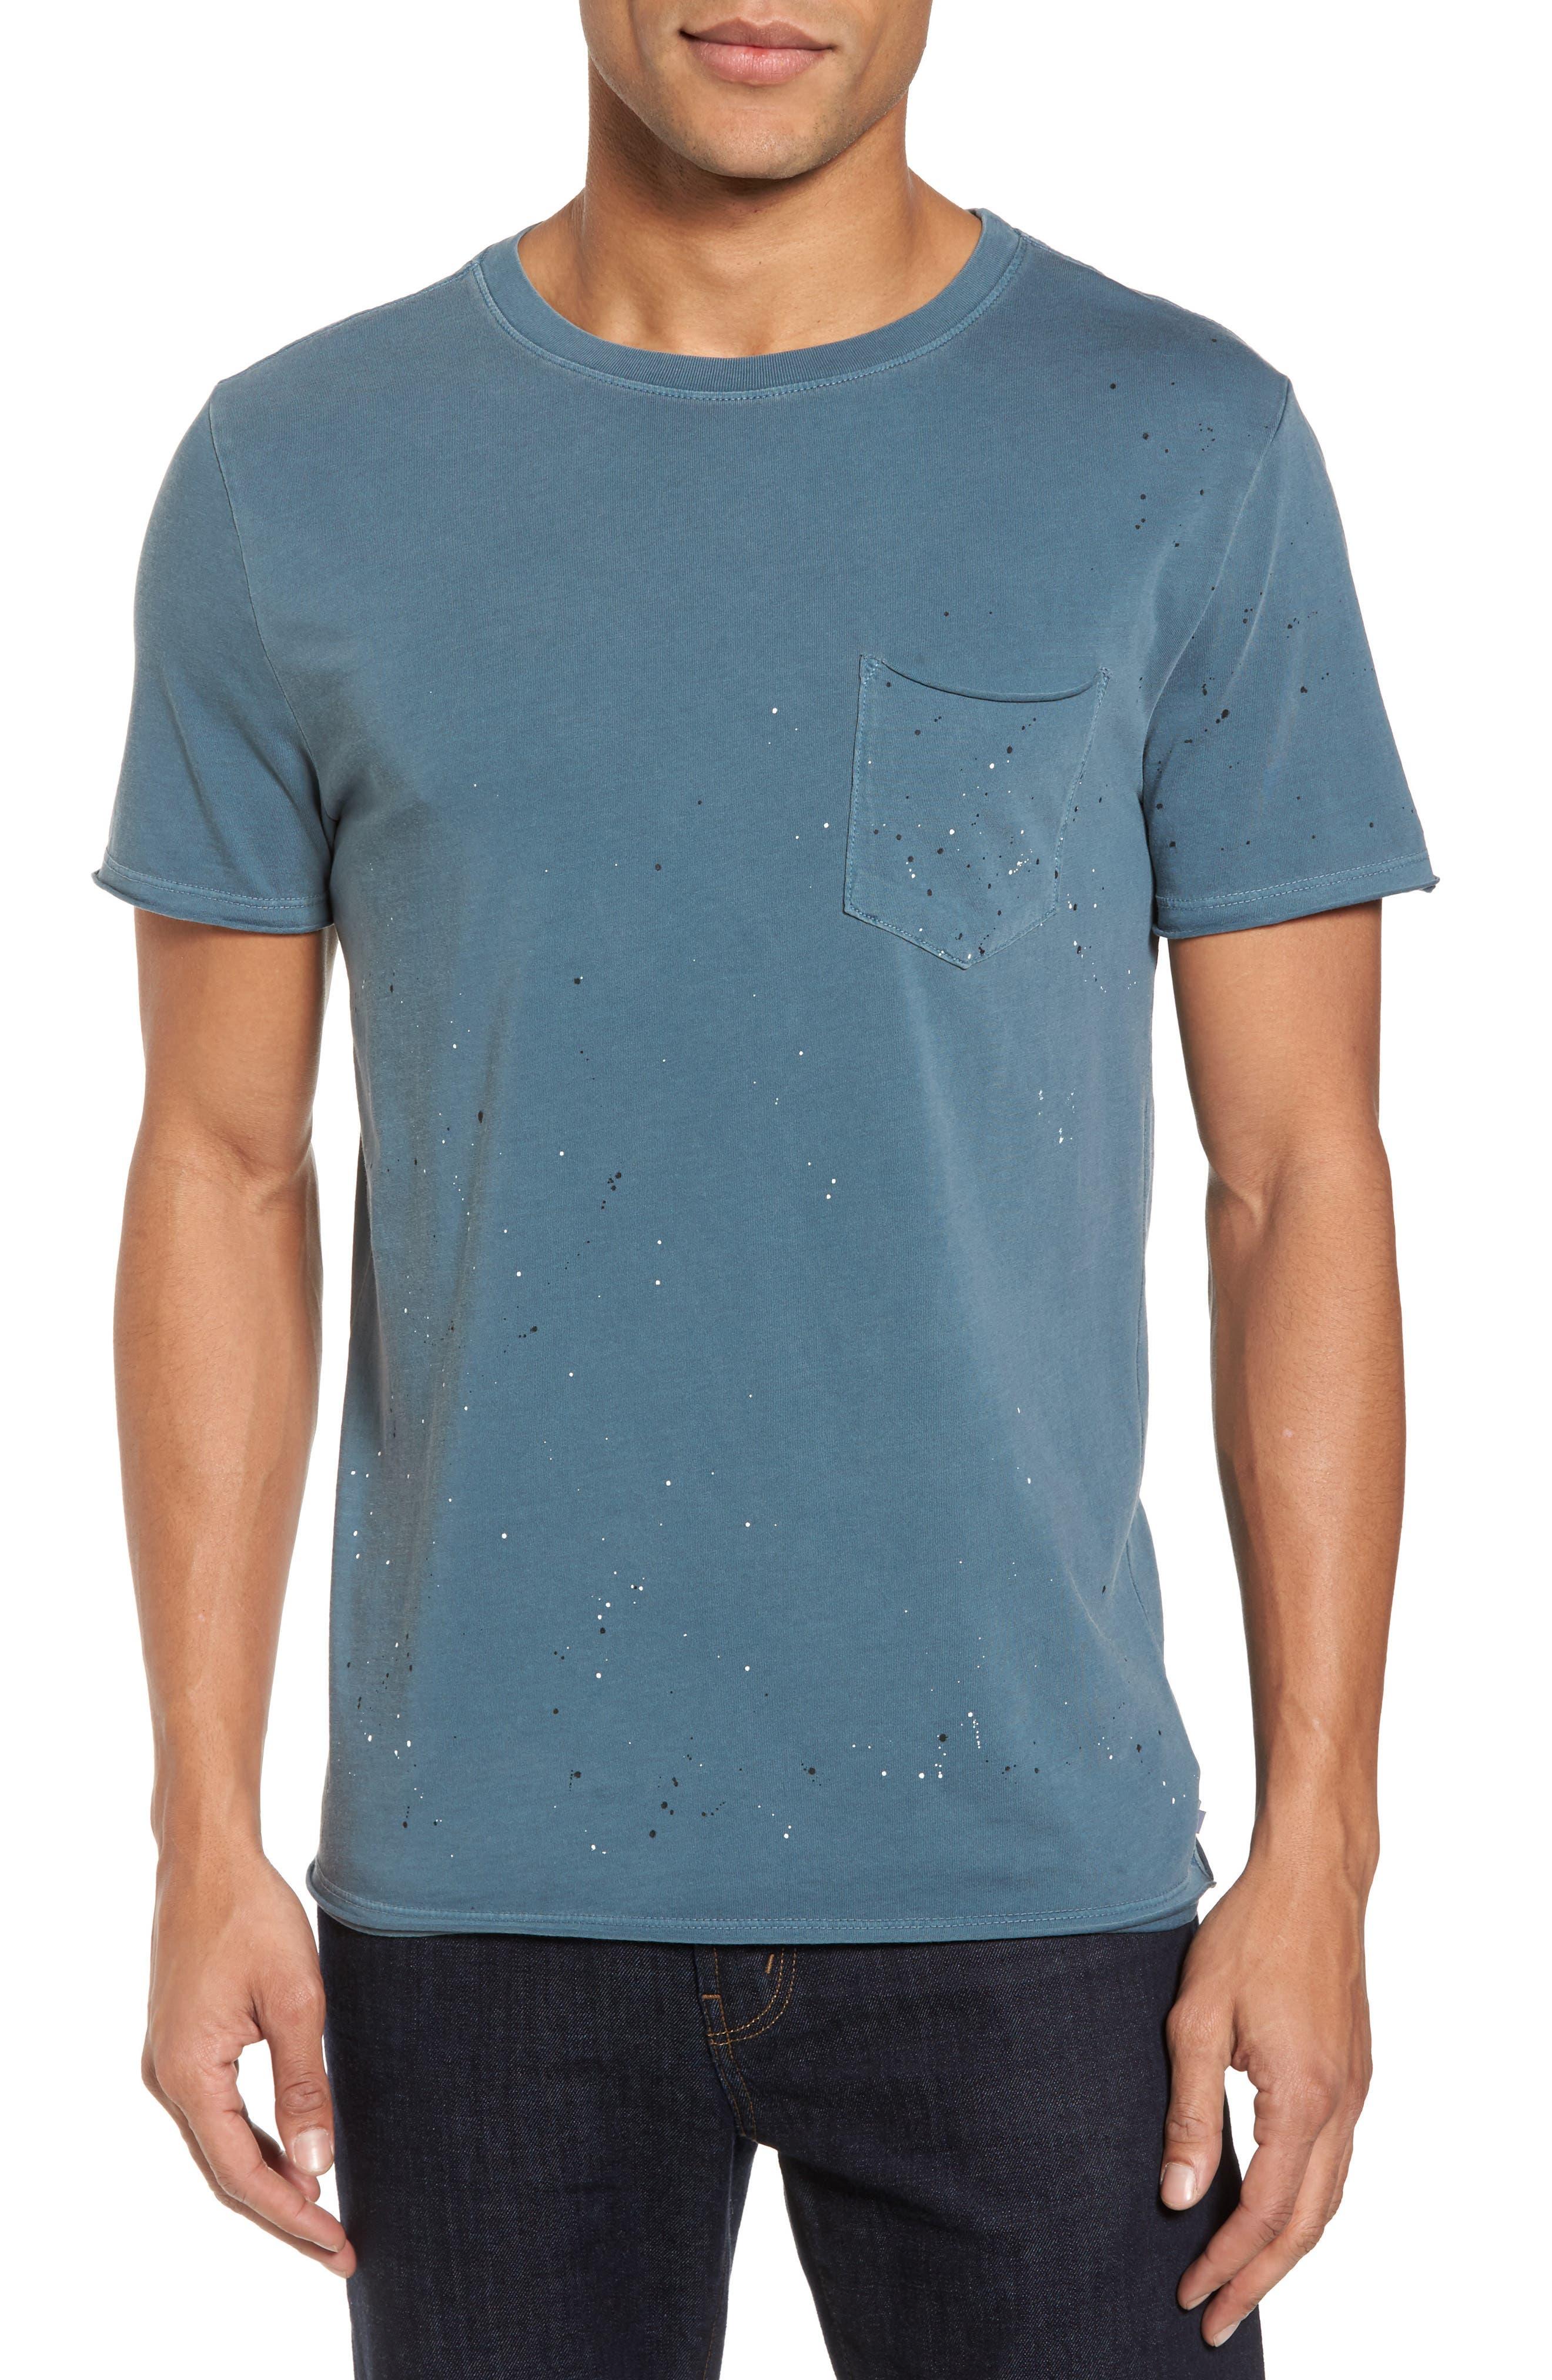 Alternate Image 1 Selected - AG Anders Slim Fit Pocket T-Shirt